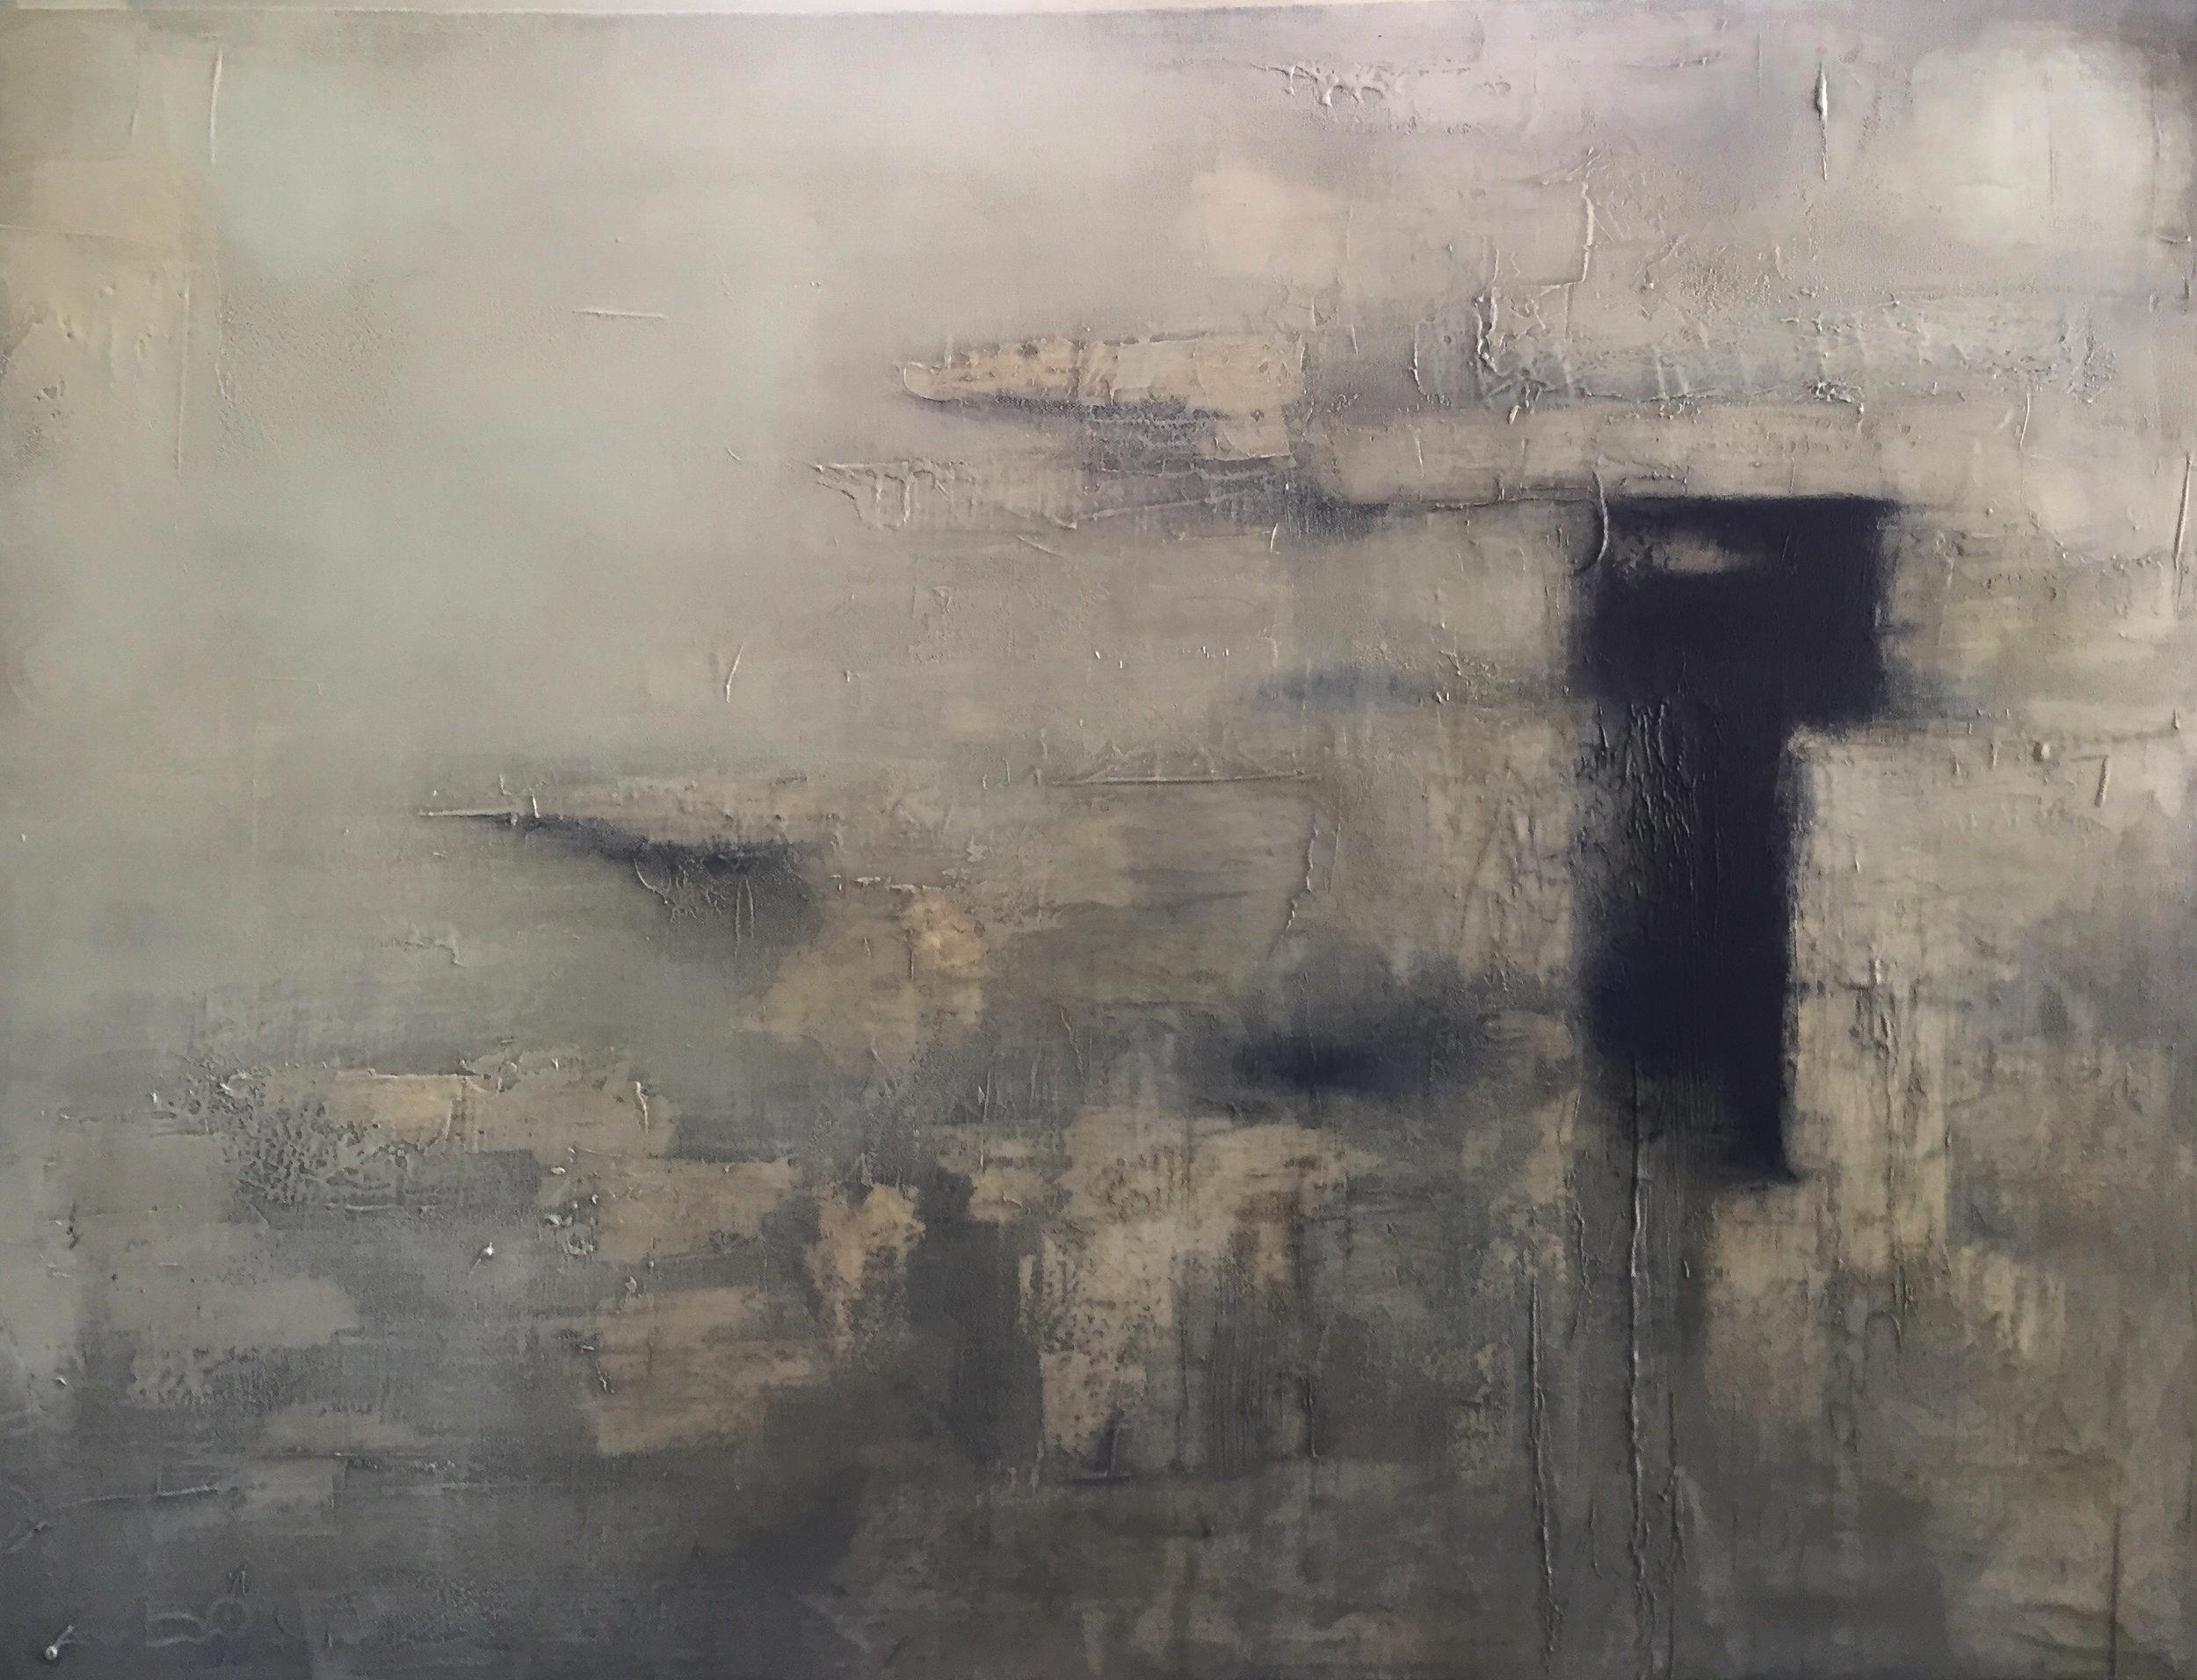 Epoch, Skellig Vl  Oil on canvas. Painting 76cm x 101cm. Frame 83cm x 109cm. €2,200